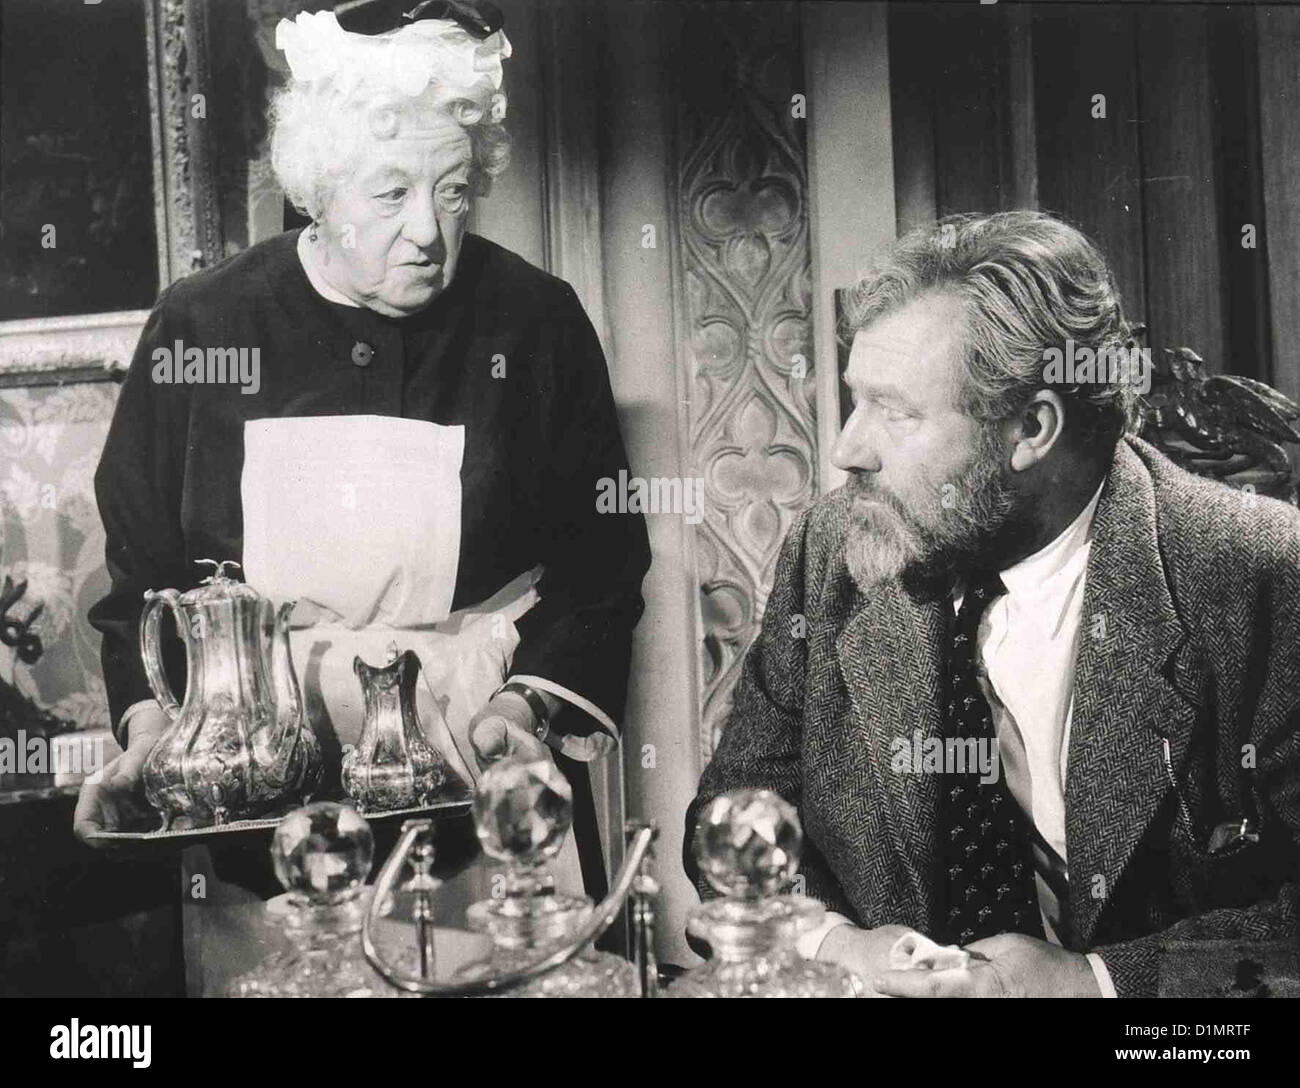 16 Uhr 50 Ab Paddington  Miss Marple: Murder She Said  Margaret Rutherford, James Robertson-Justice Um einen Mord - Stock Image